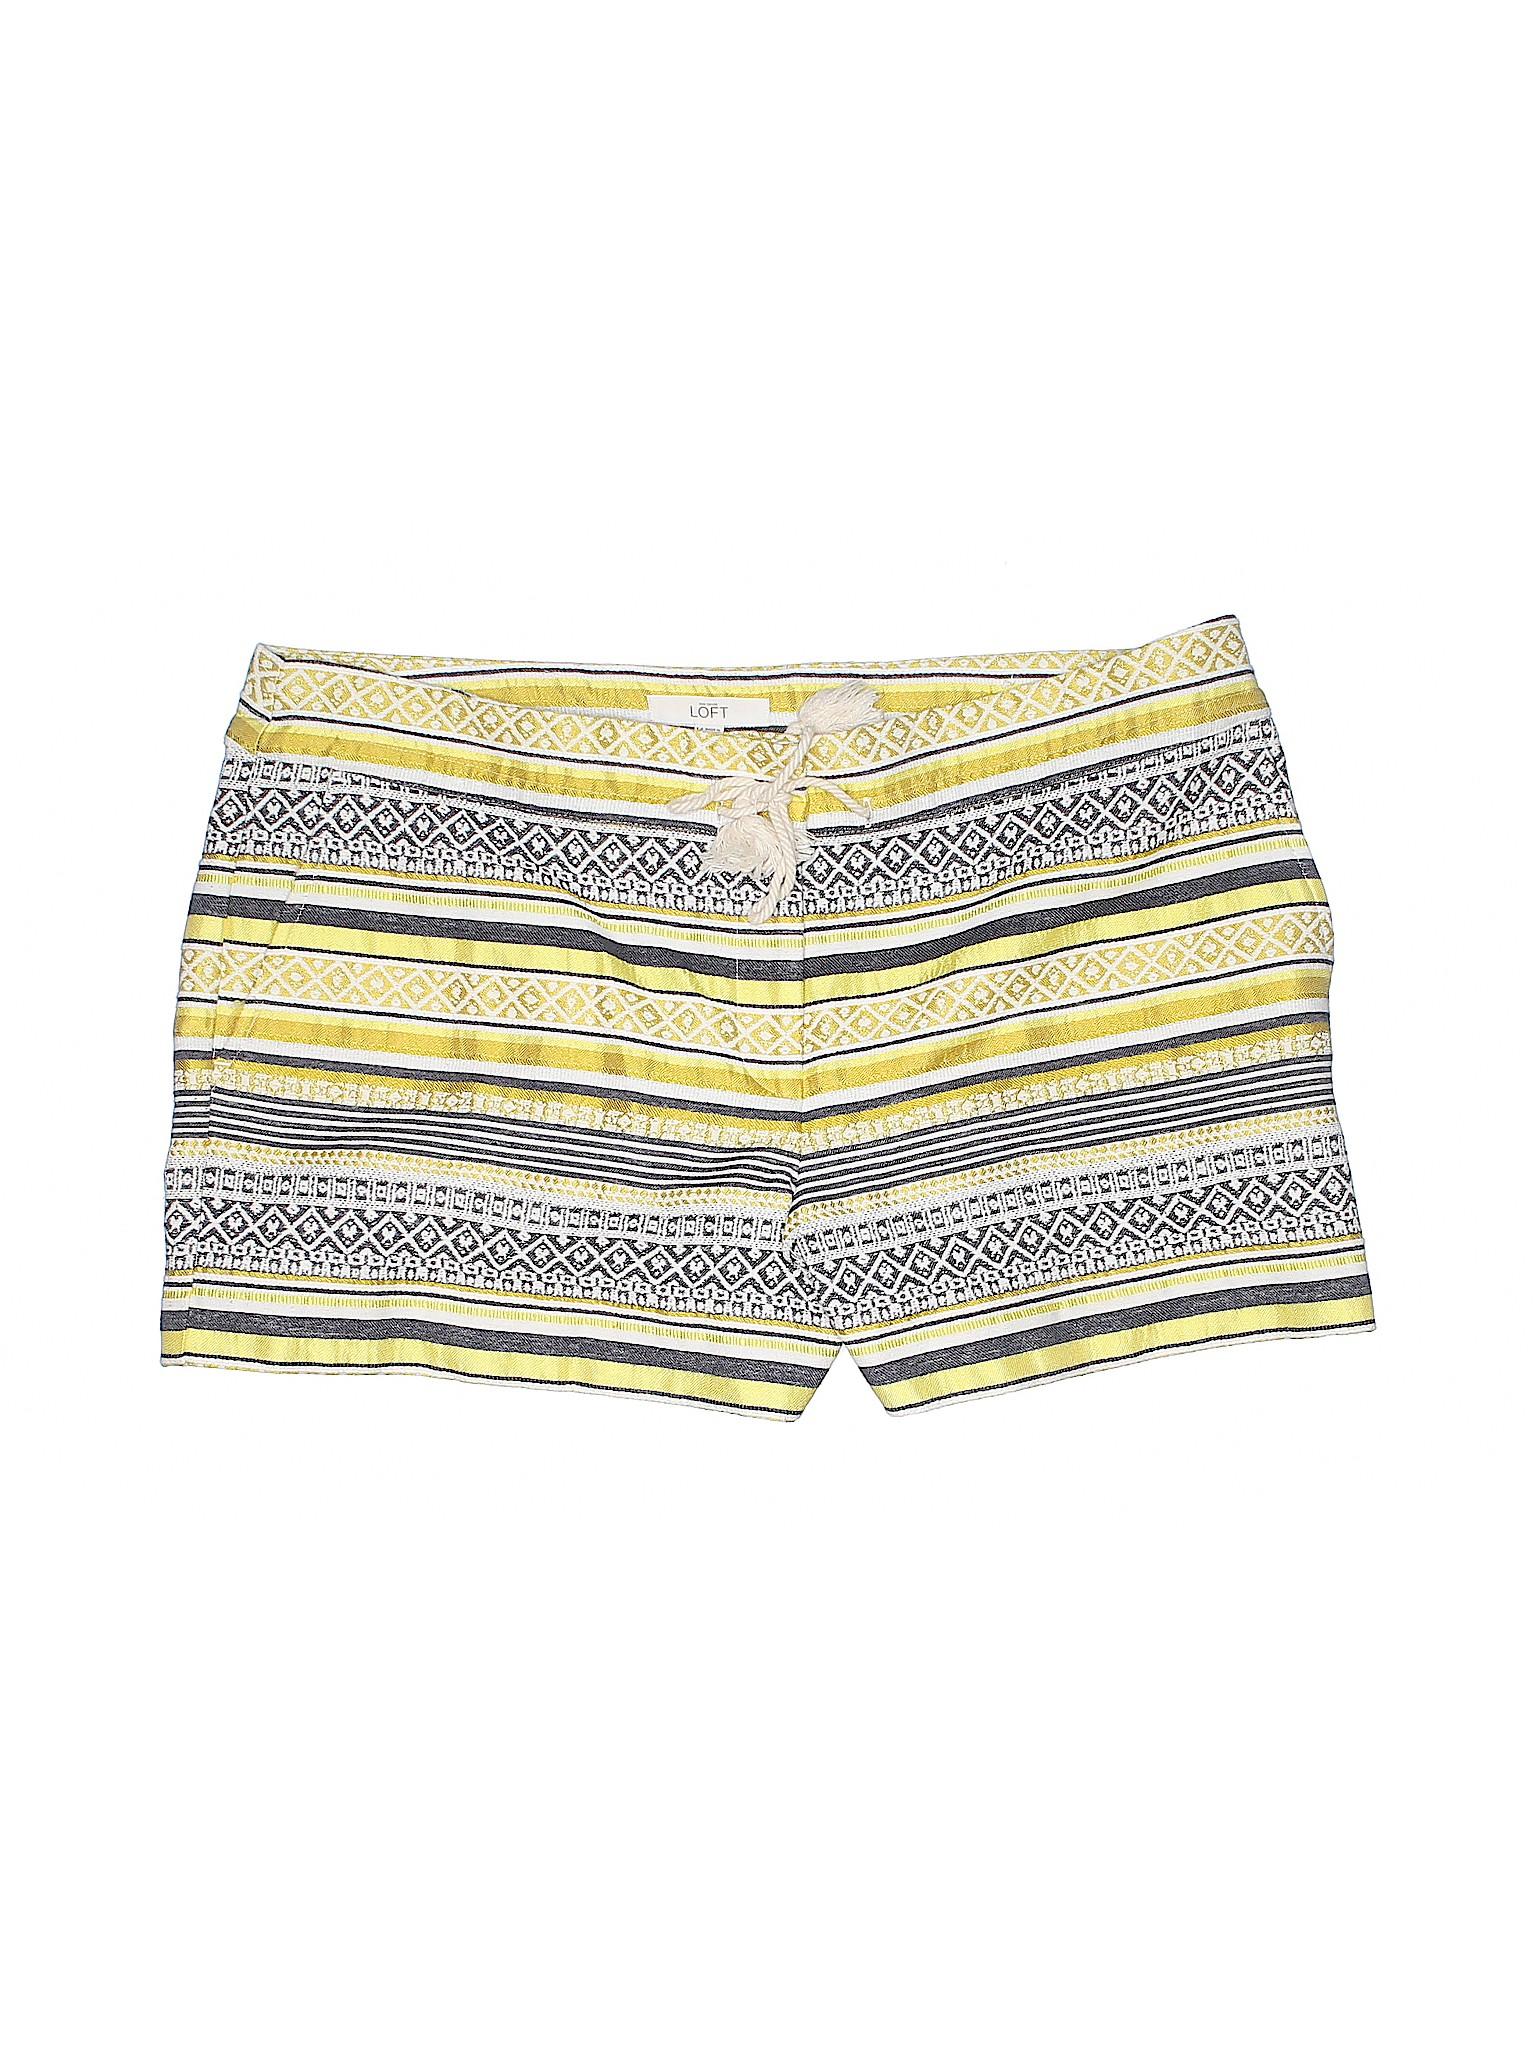 Shorts Taylor LOFT Dressy Ann Boutique wIPq45S